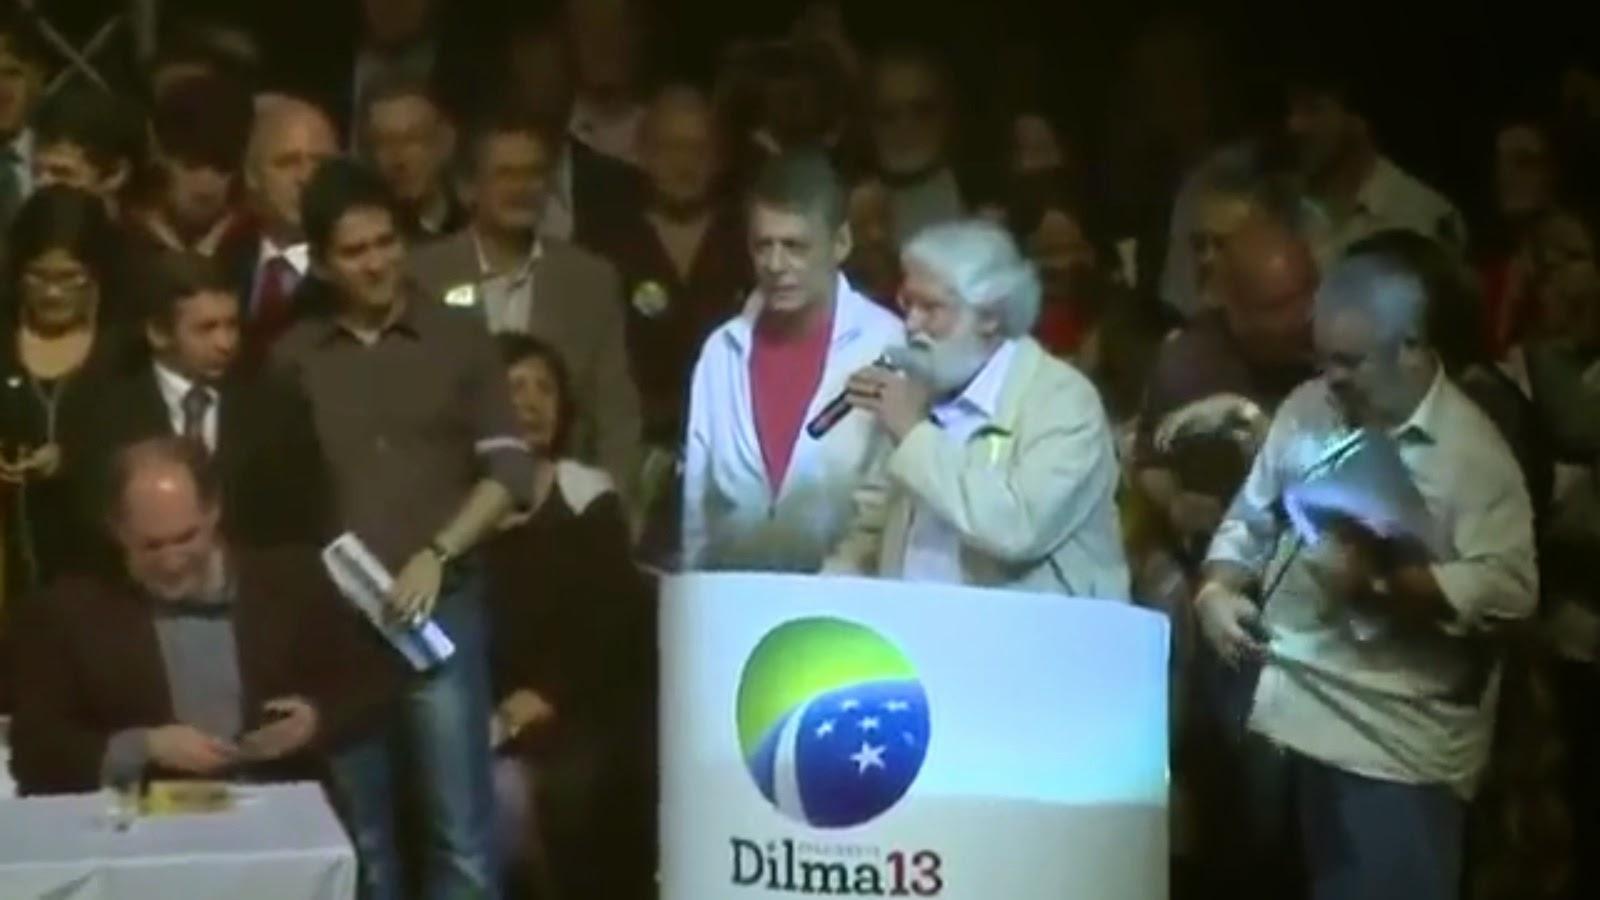 Chico Buarque & Leonardo Boff, October 2010.